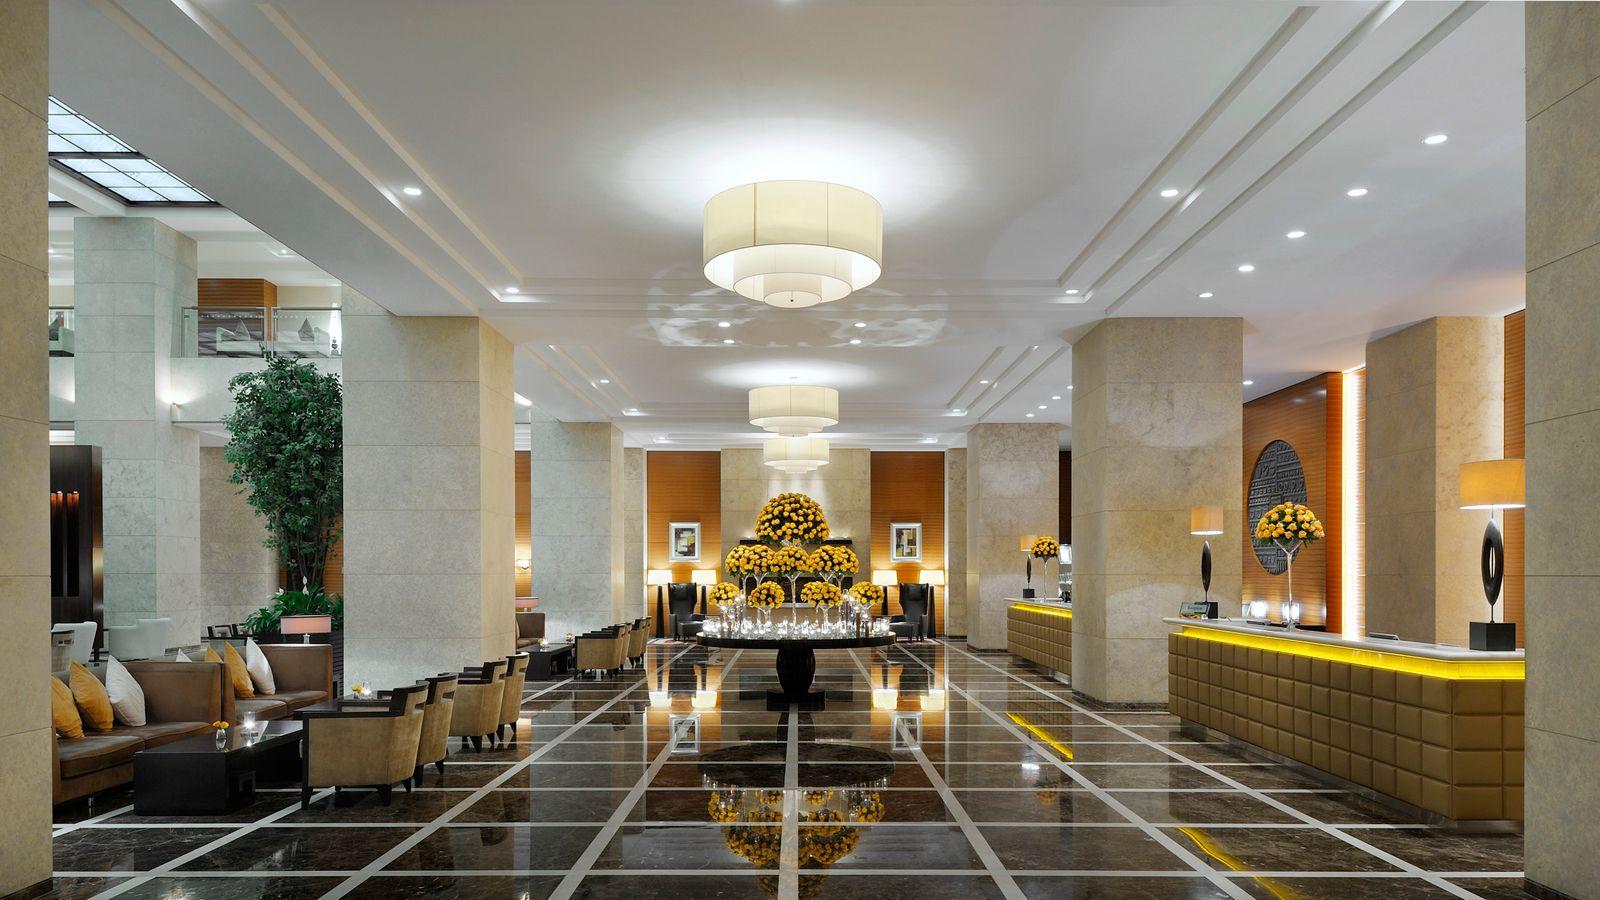 Marvelous Luxury House In Dubai #7: Grosvenor House Dubai U2013 A Luxury Collection Hotel